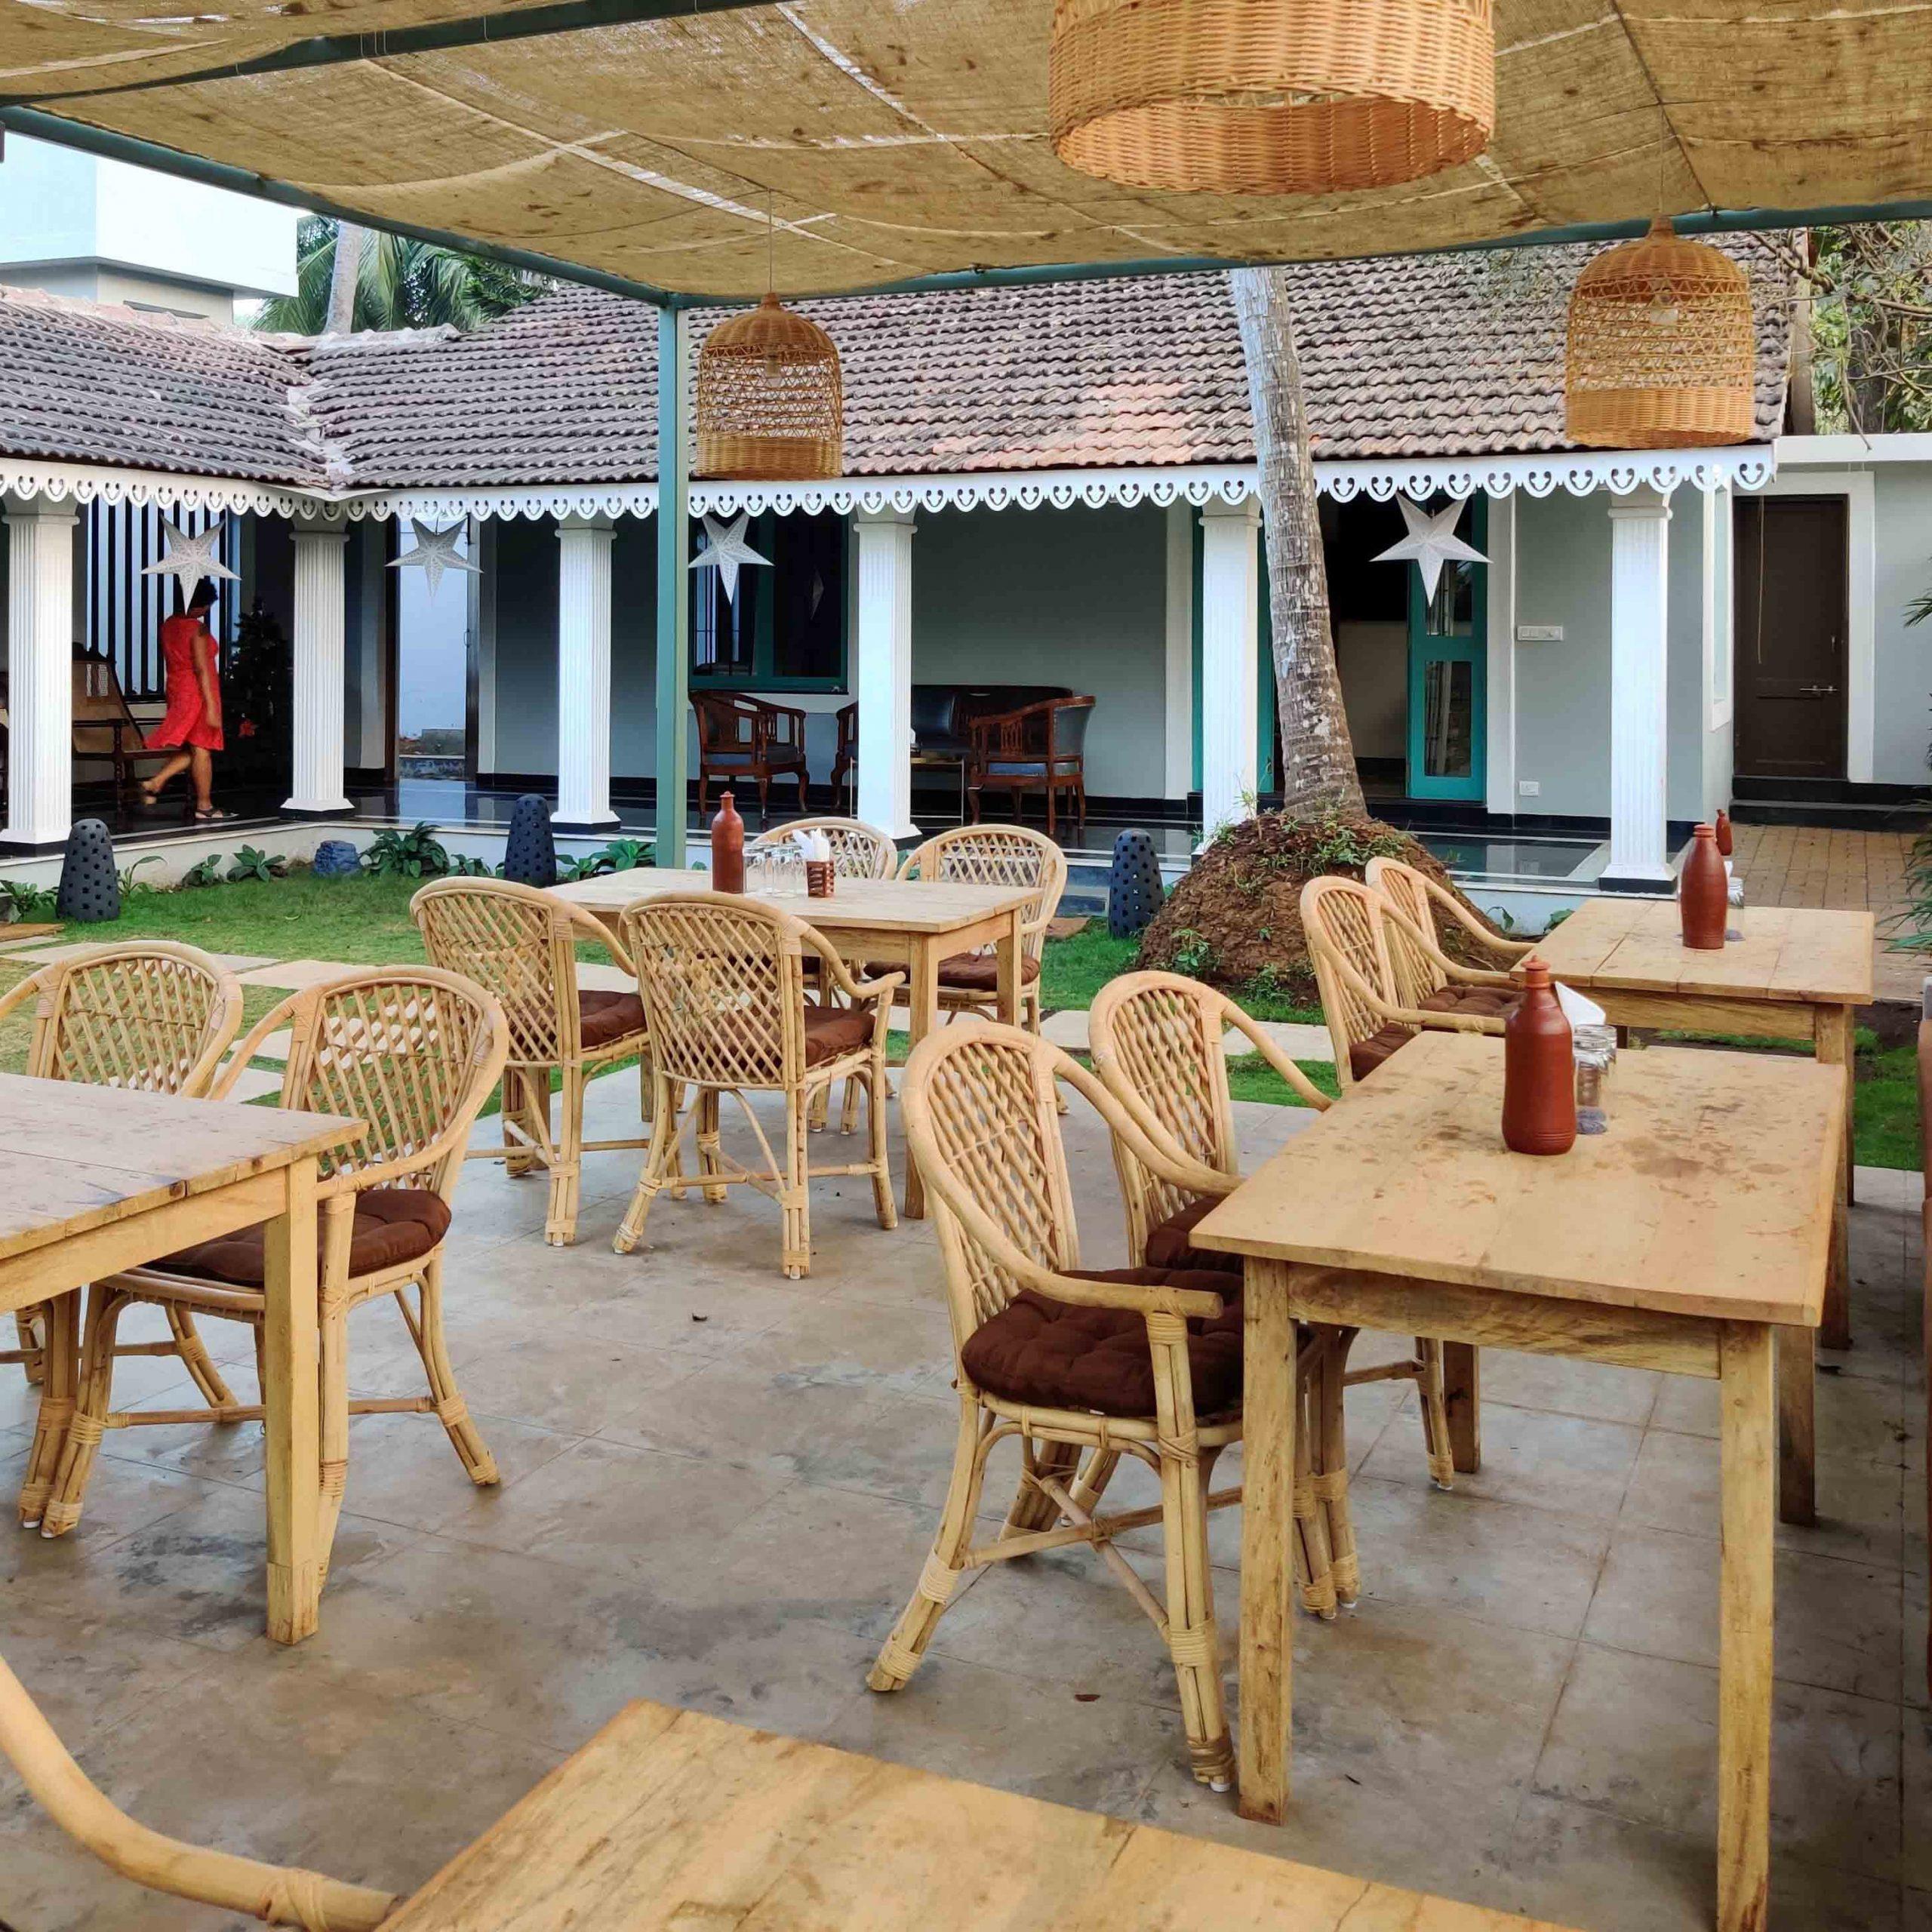 Edible Archives: Restaurant With Rare Rice Dishes | Lbb Goa tout Table De Jardin Super U